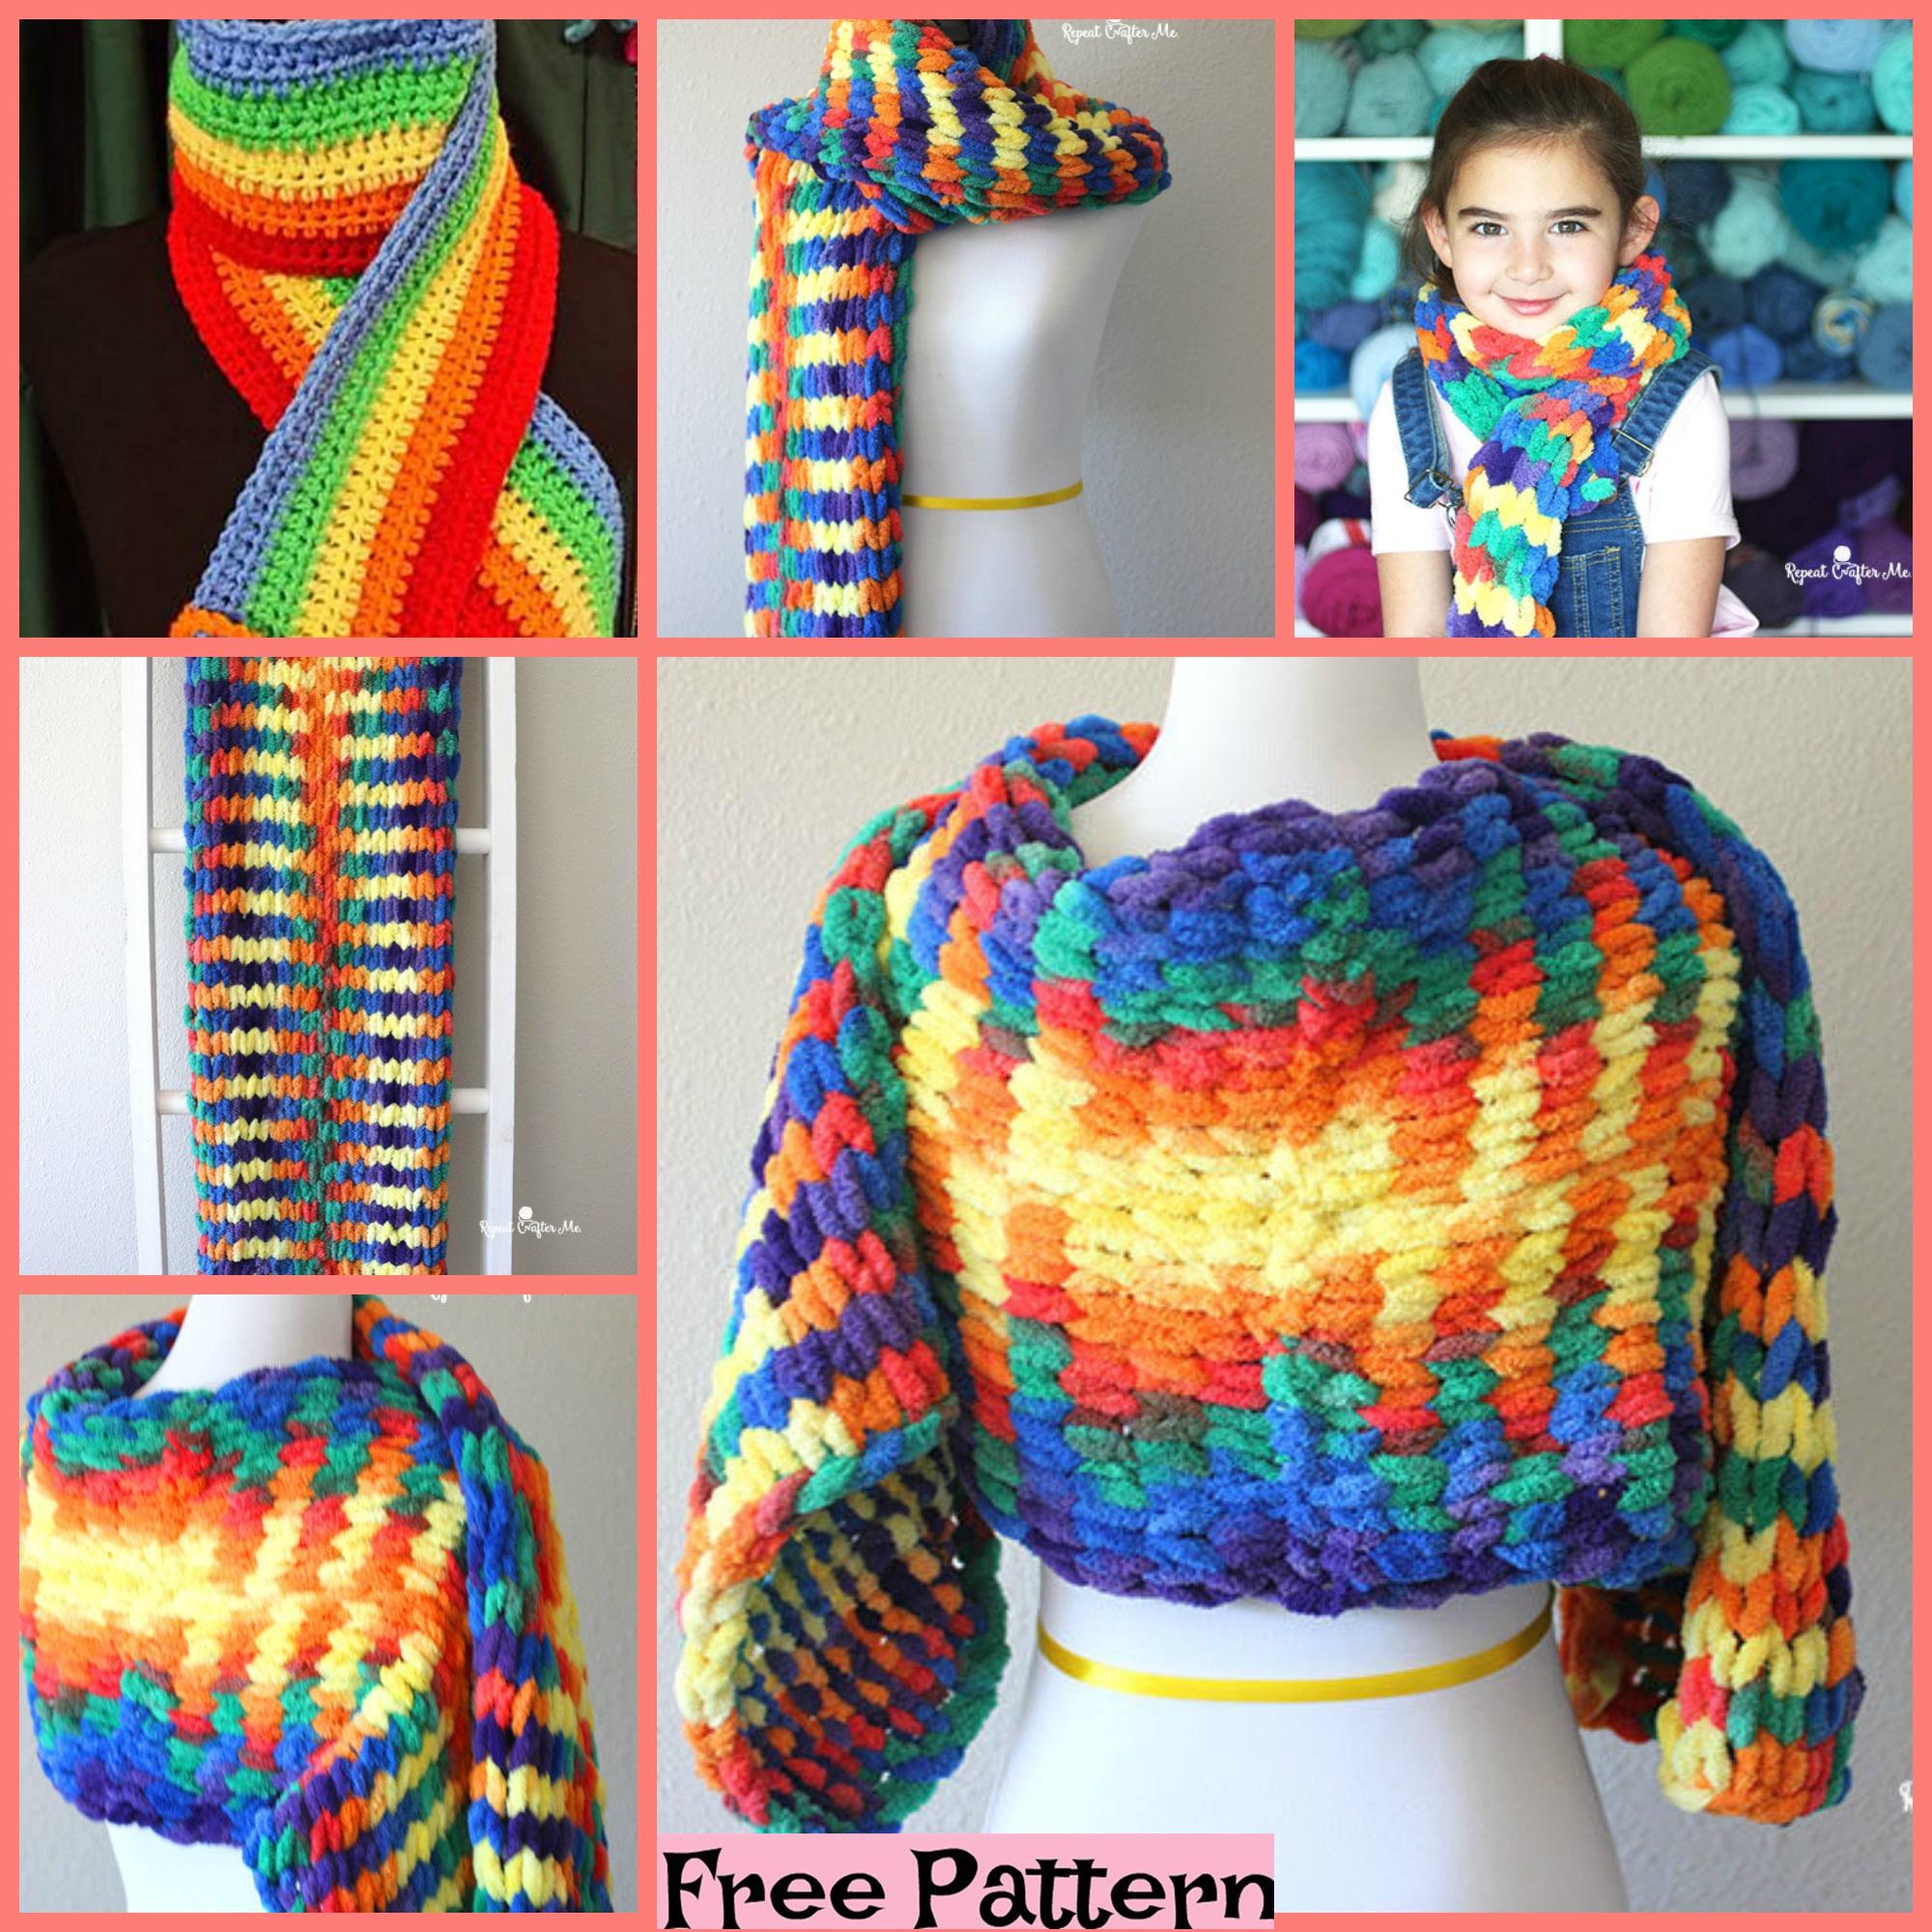 diy4ever-Crochet Bright Rainbow Scarf - Free Patterns